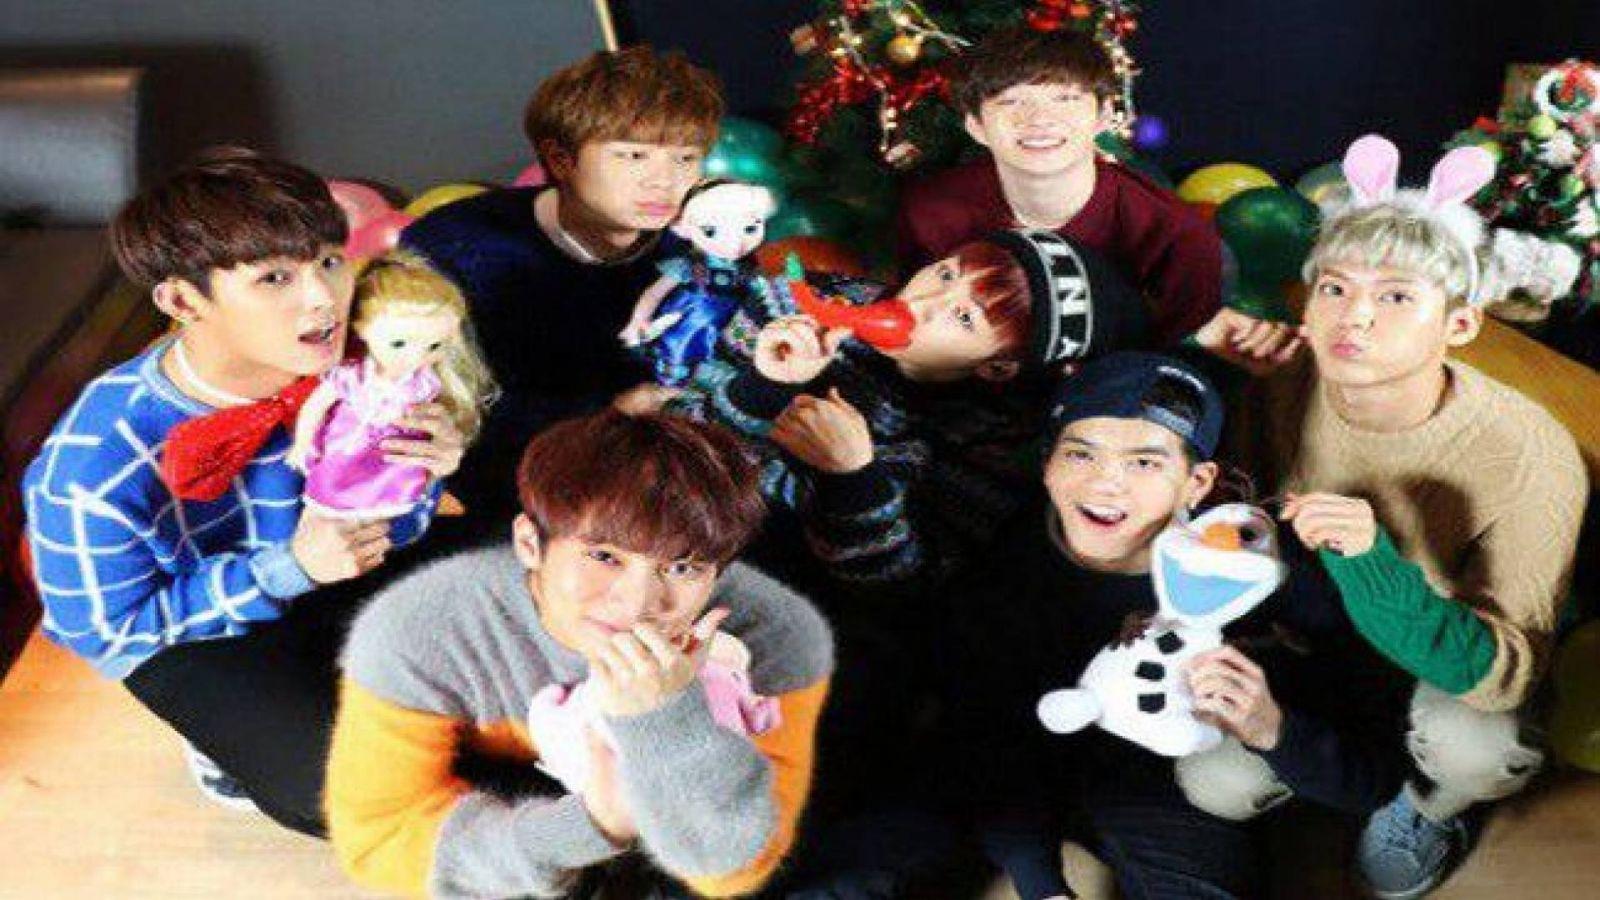 The Winter's Tale, novo mini álbum do BTOB © Cube Entertainment